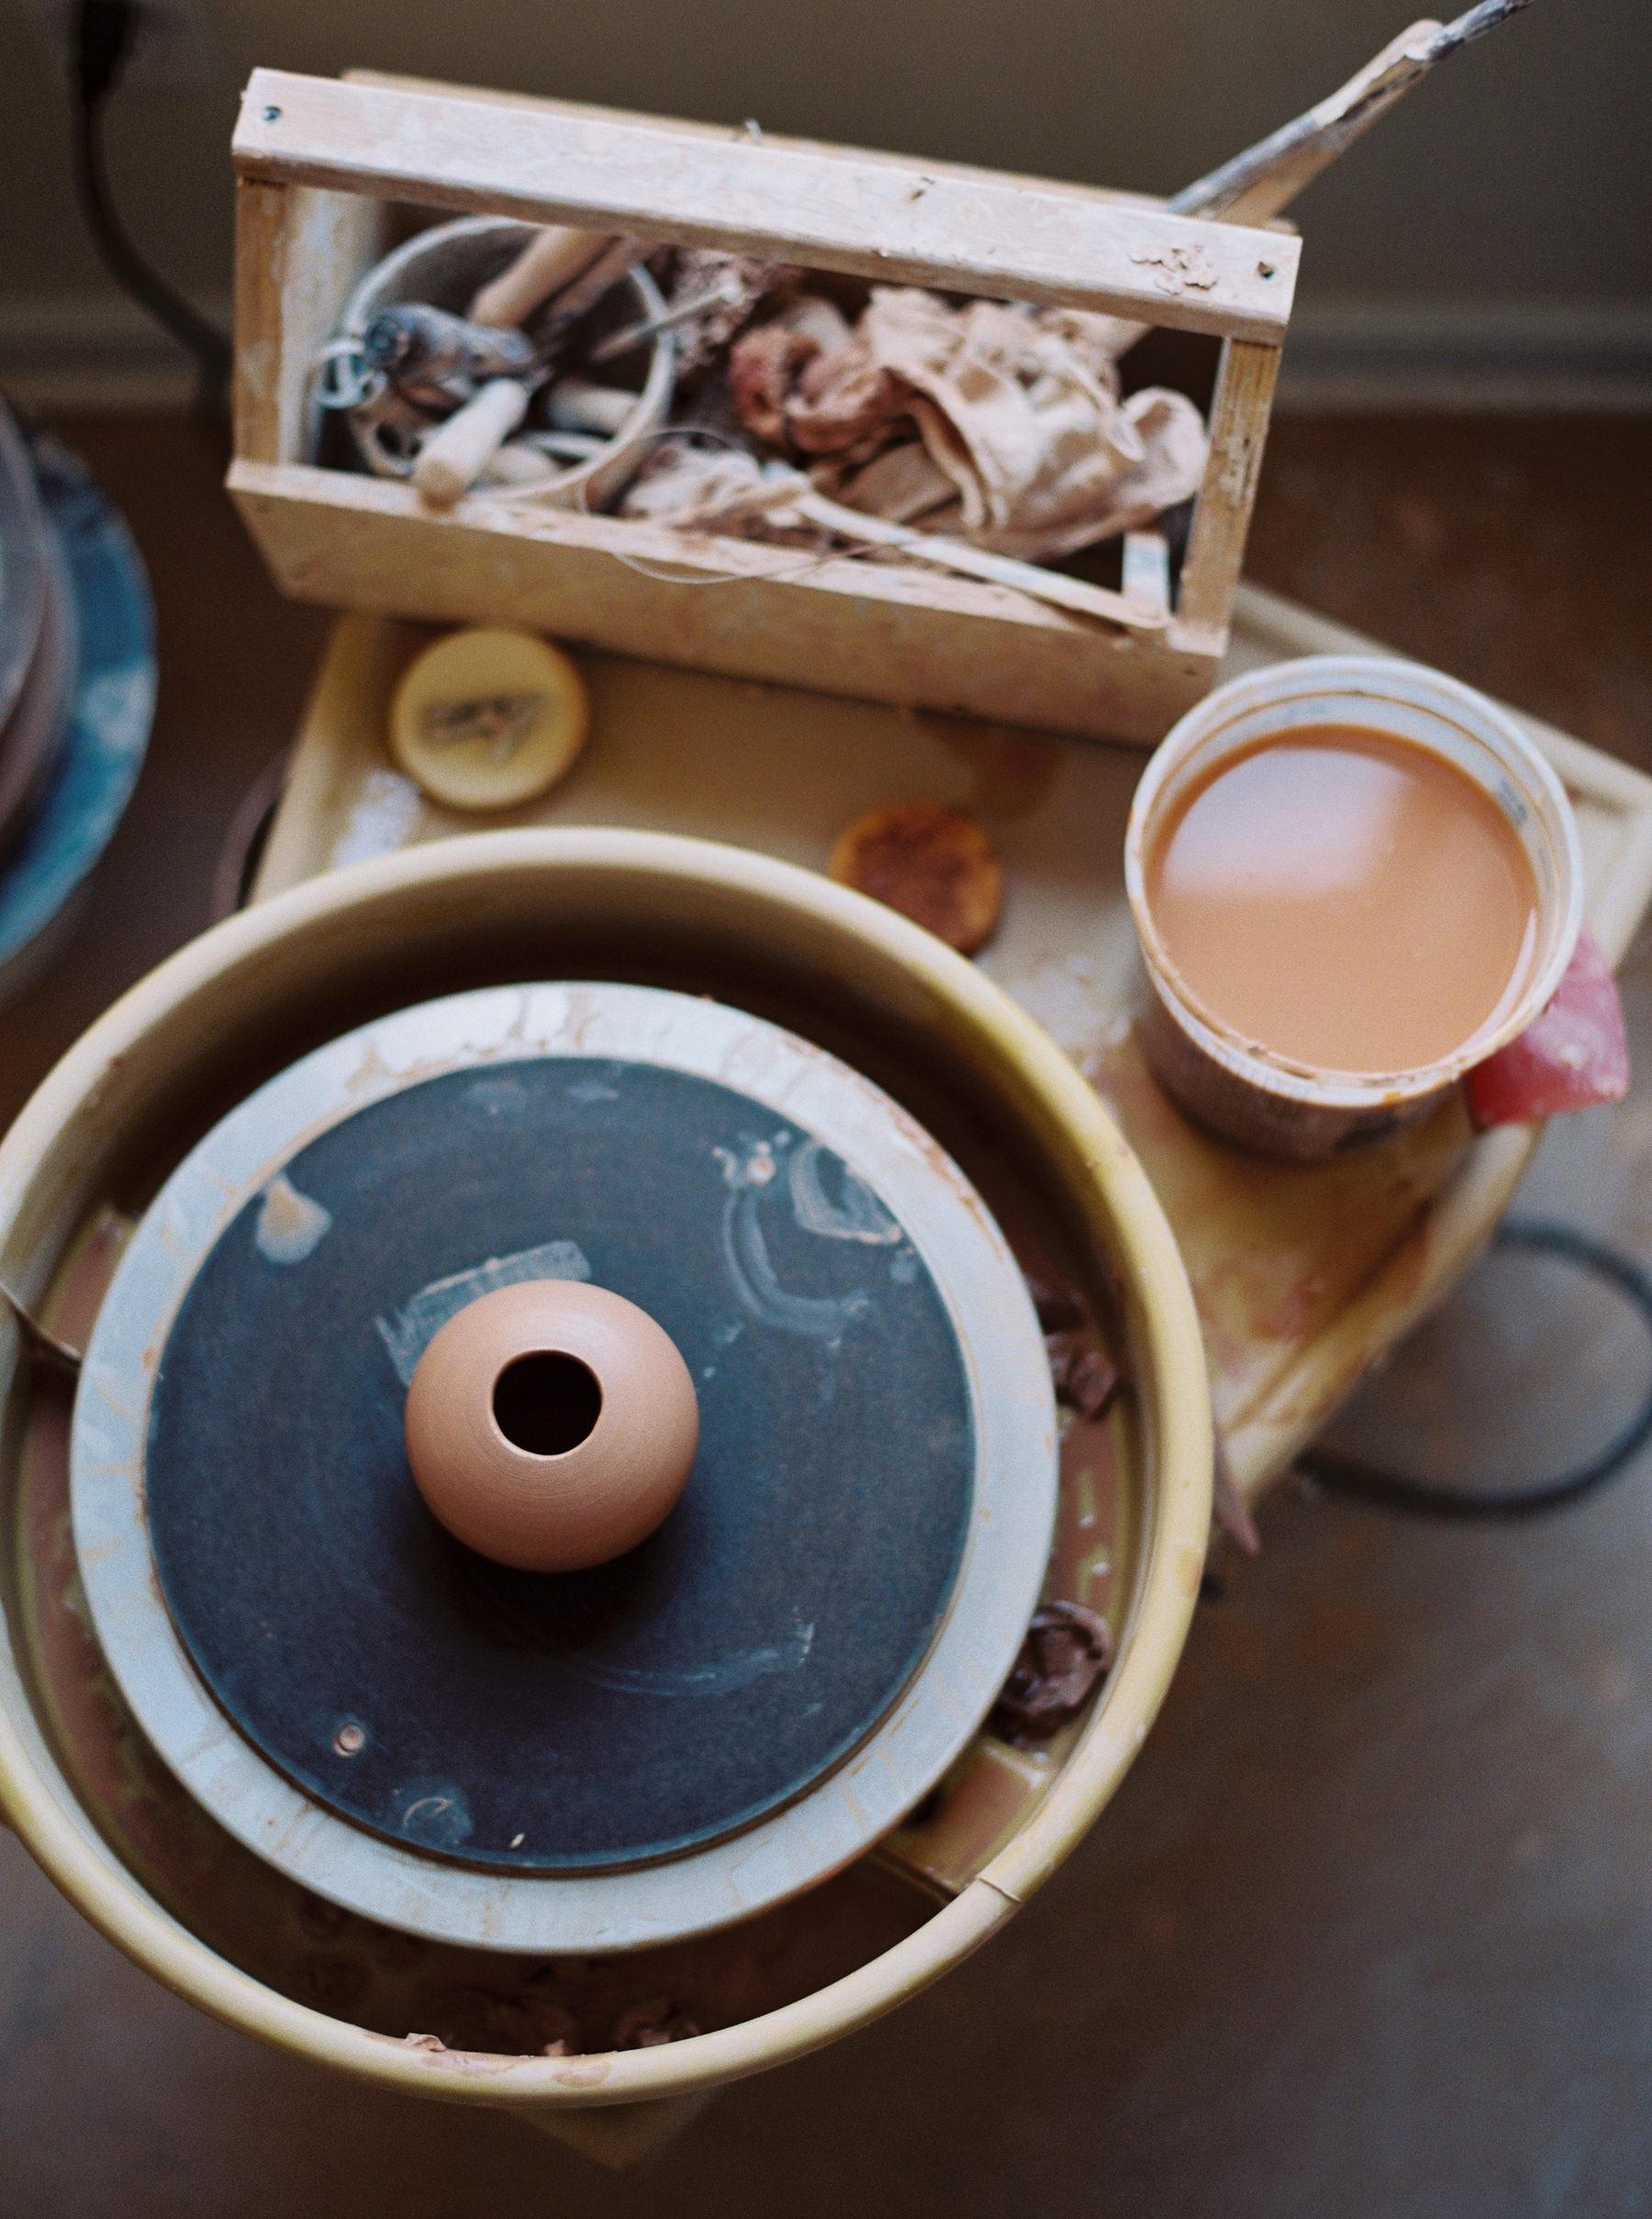 artistprofile-katherinemoes-pottery-annapeters-annapetersphoto-unearthing.tc-15.jpg